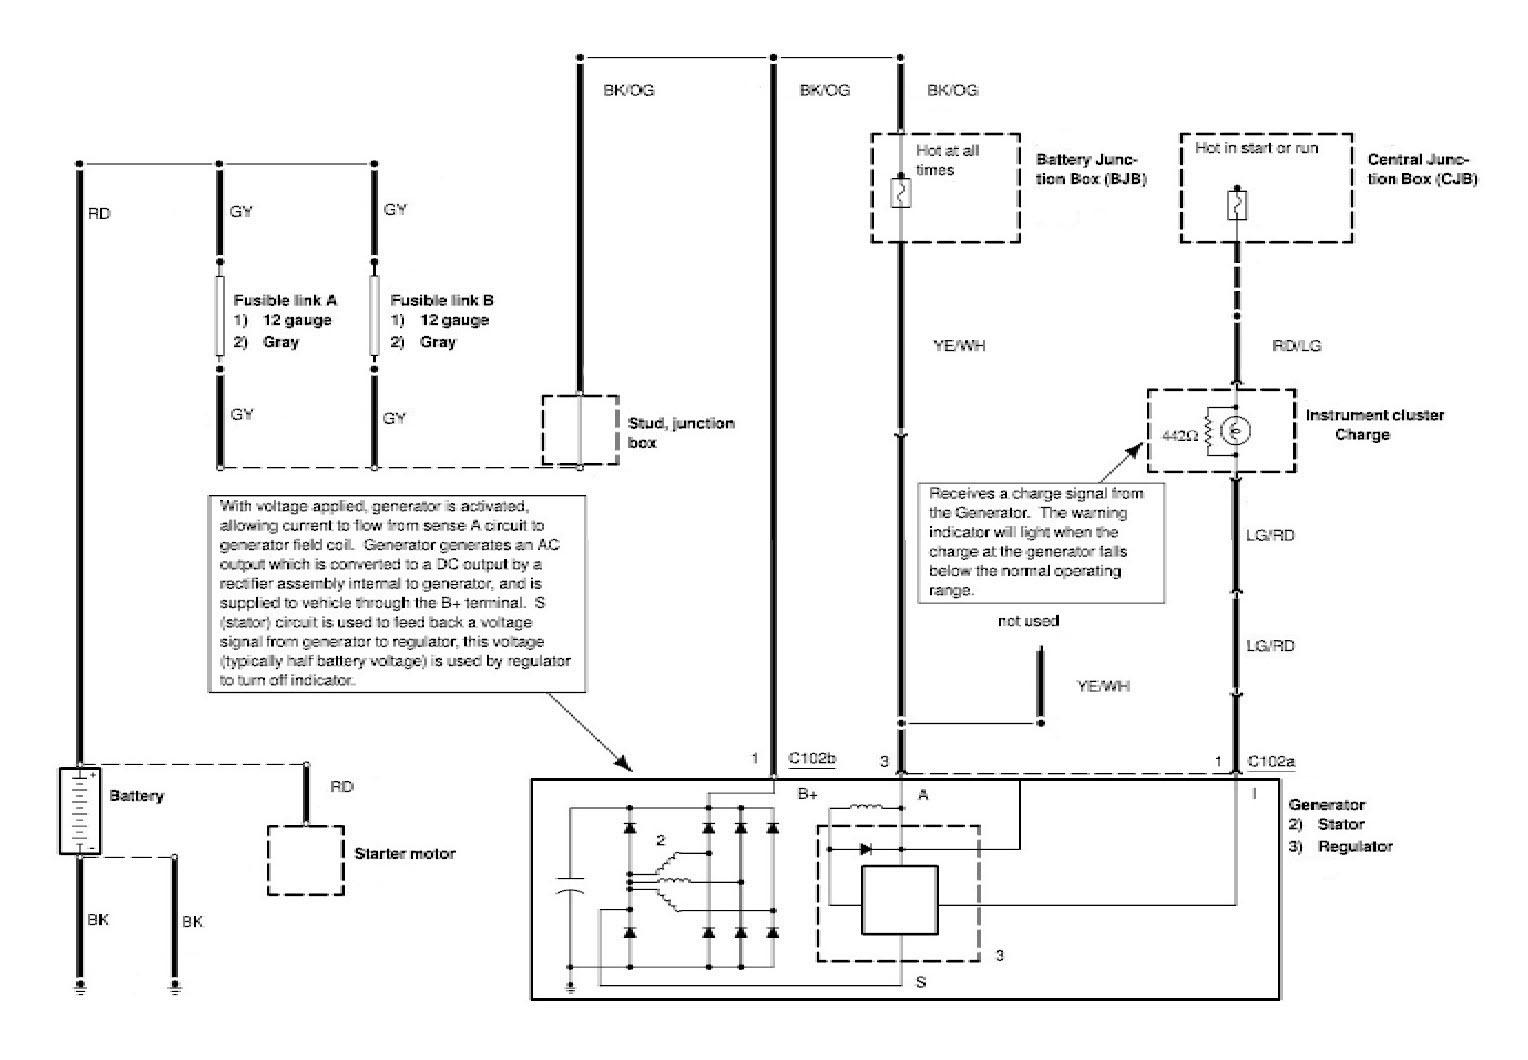 Phenomenal 1986 Ford Ltd Wiring Diagram Wiring Diagram Wiring Cloud Dulfrecoveryedborg